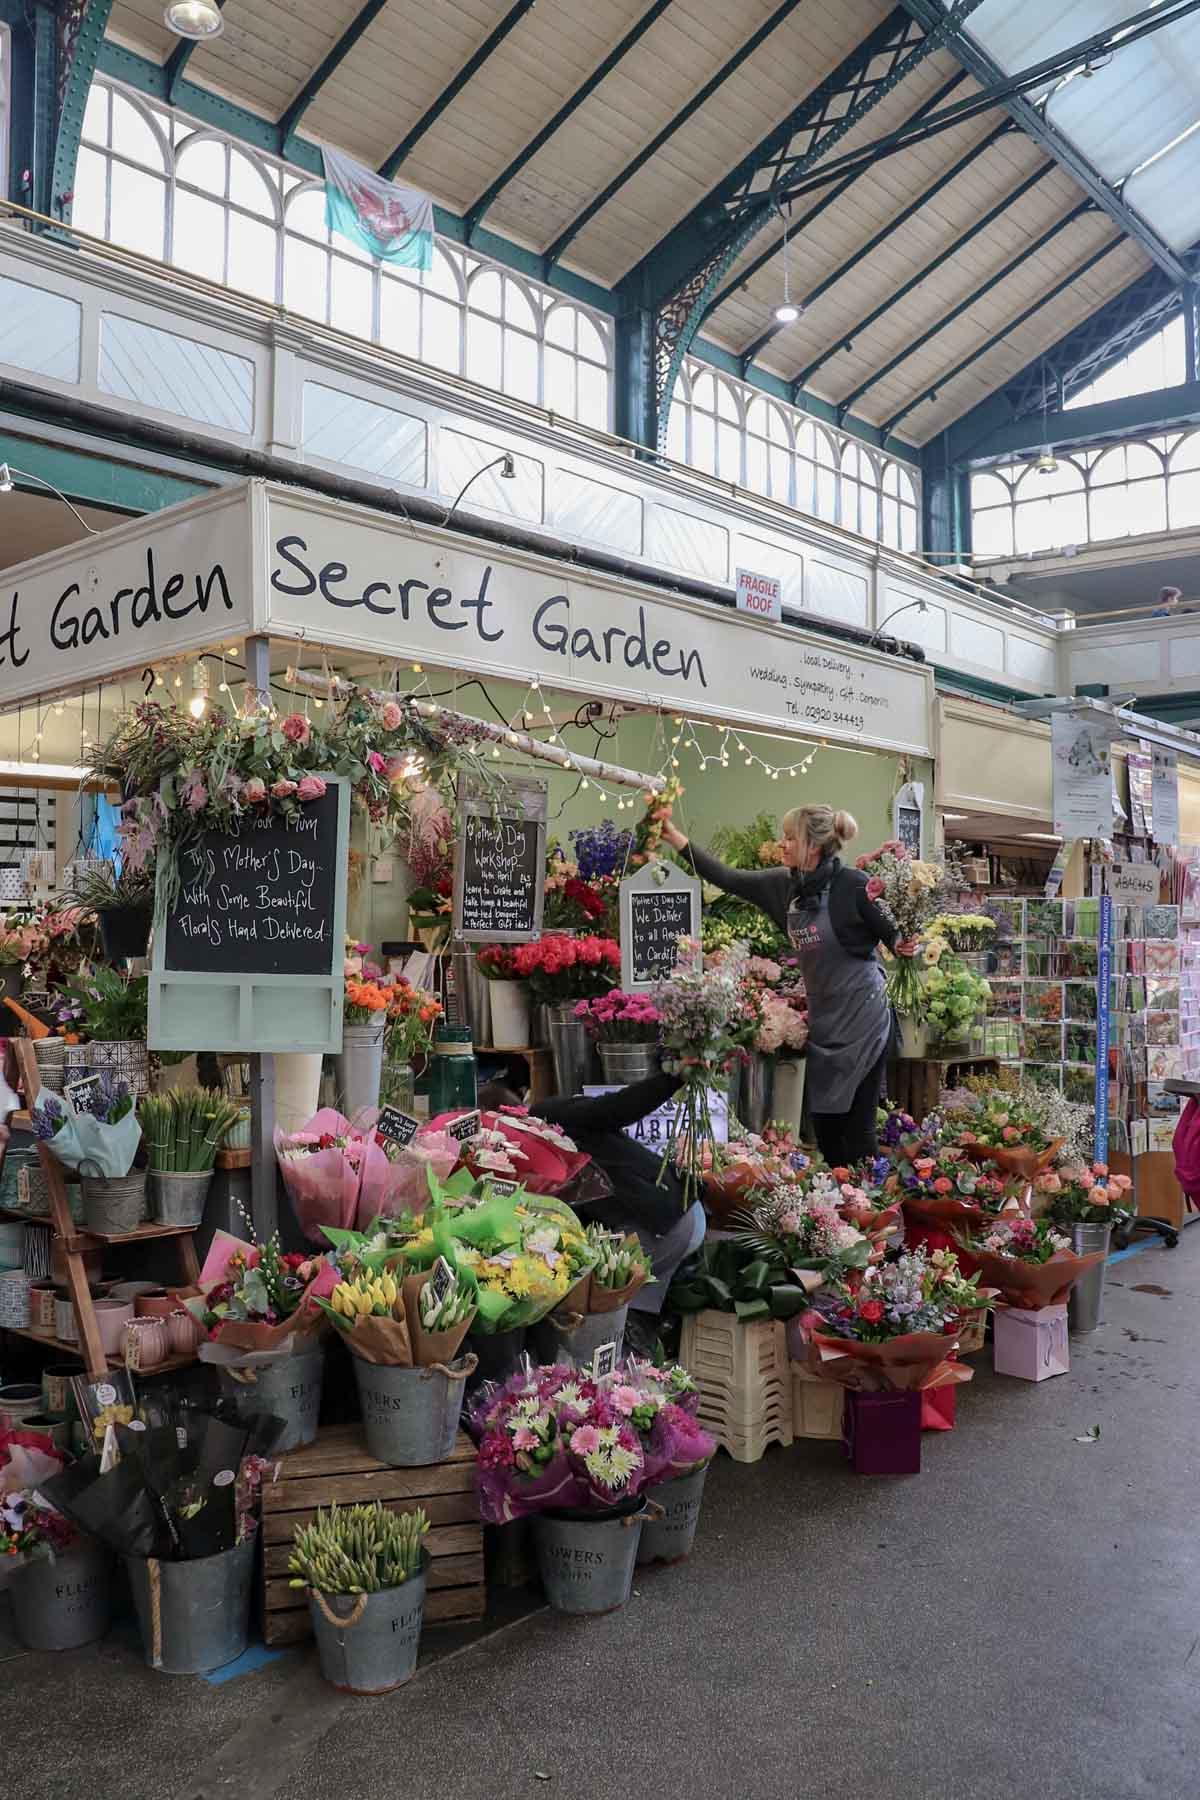 De leukste dingen om te doen in Cardiff, Cardiff Market - Map of Joy